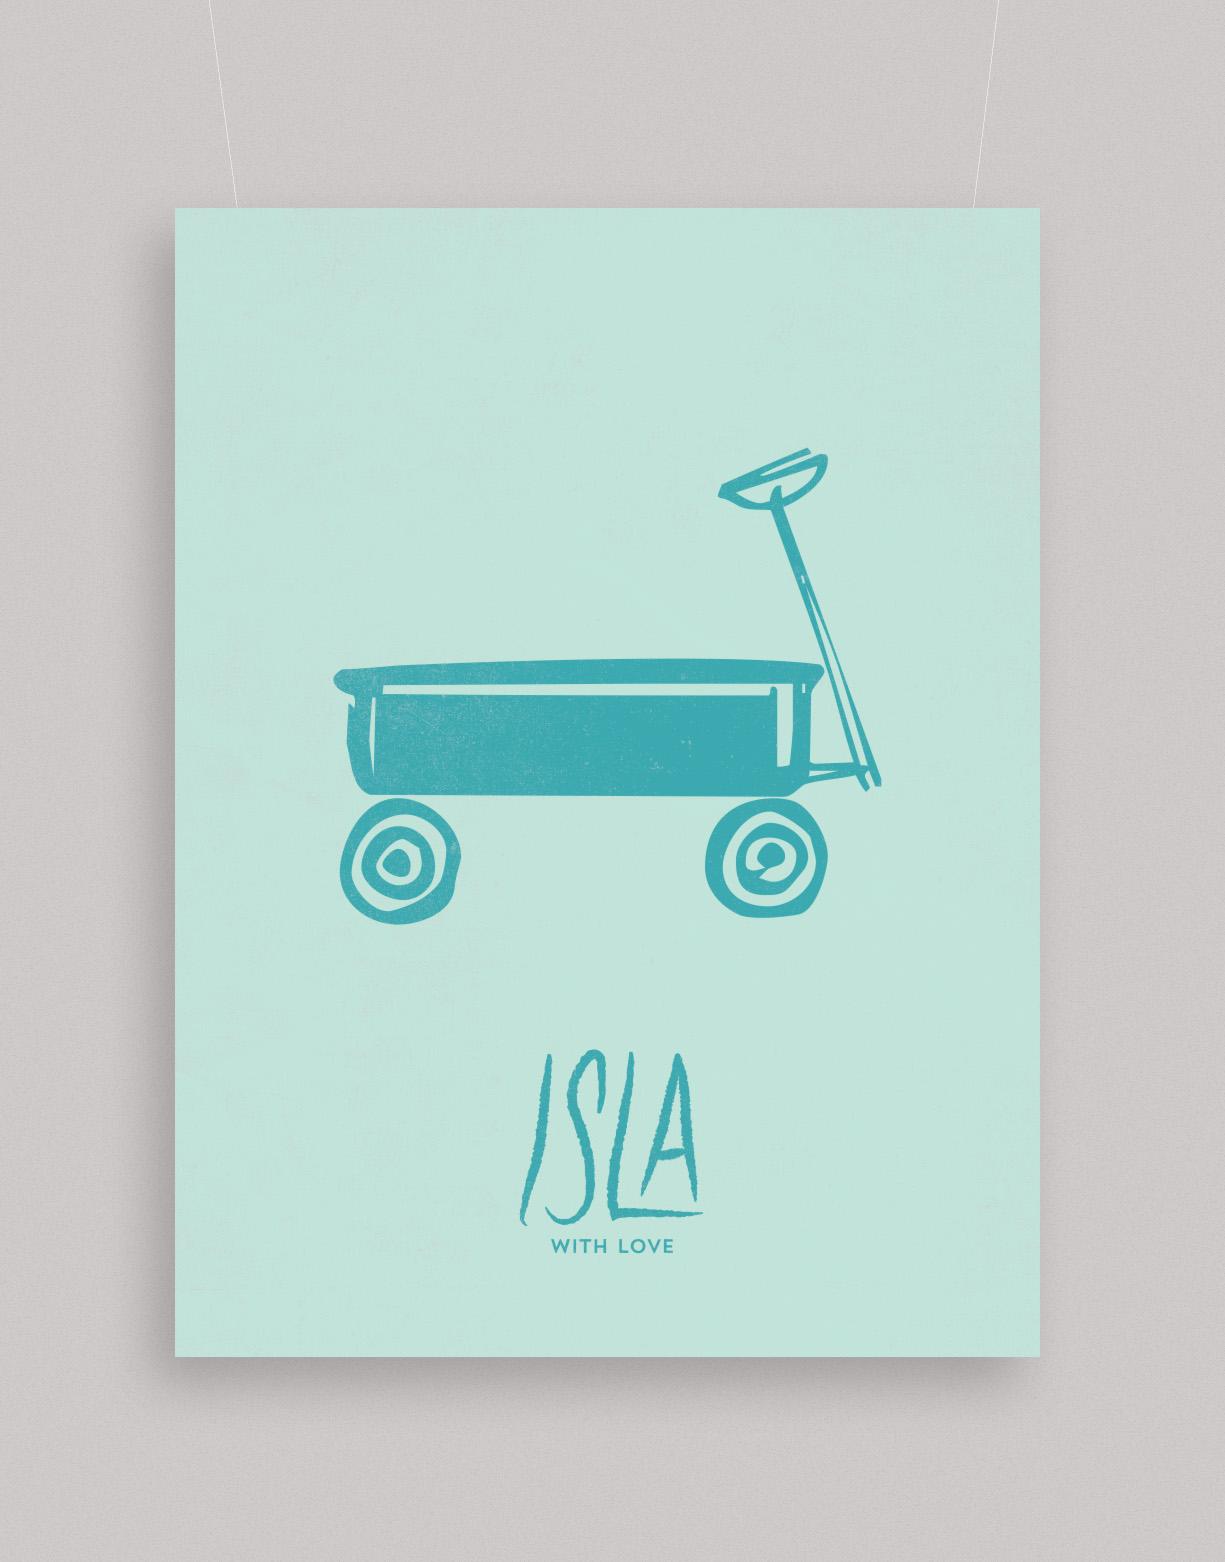 Posters_Isla 08.jpg